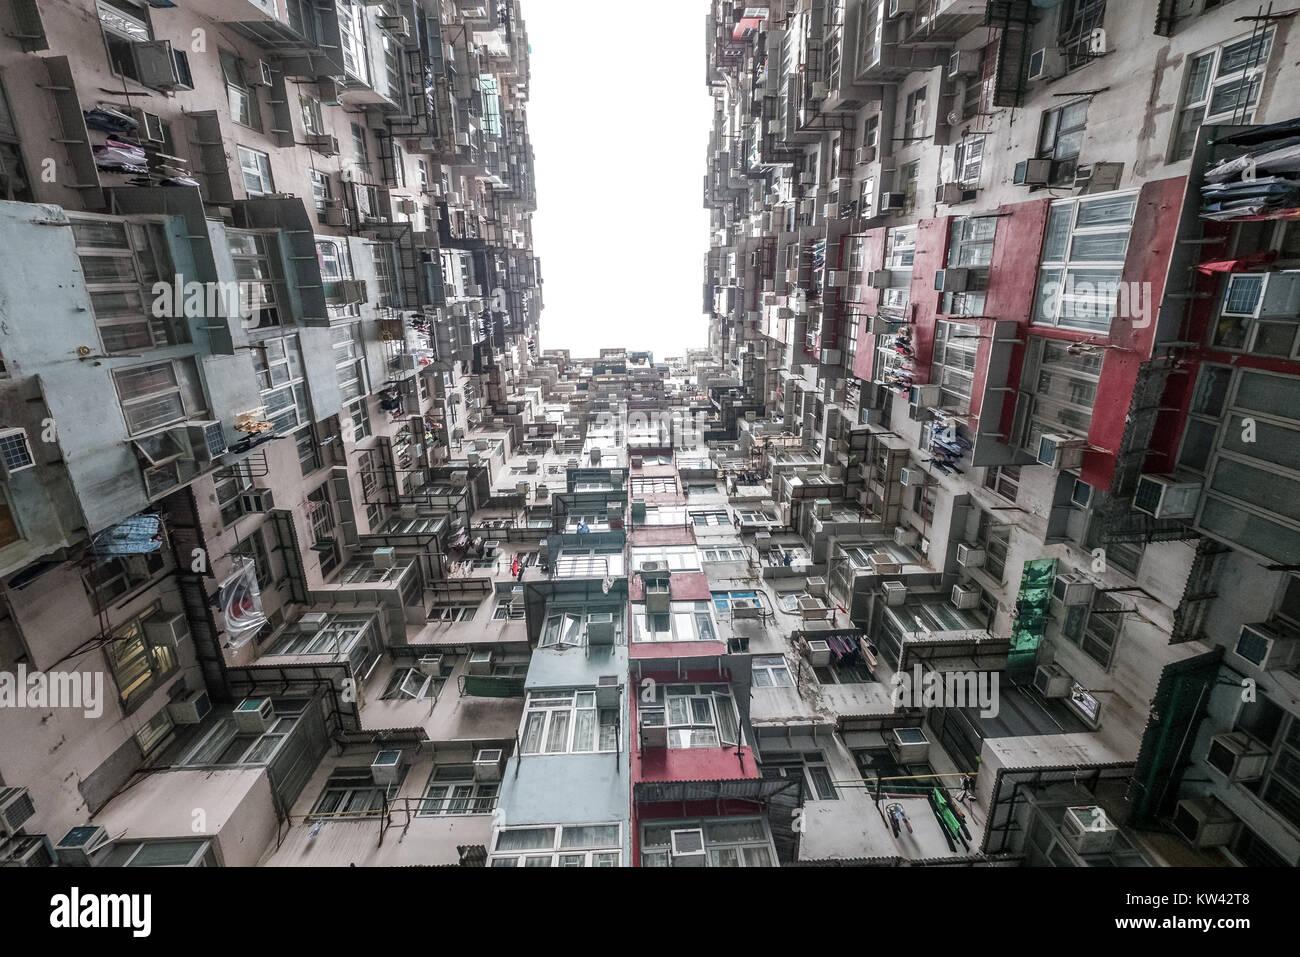 hong kong apartment buildings Stock Photo: 170349768 - Alamy